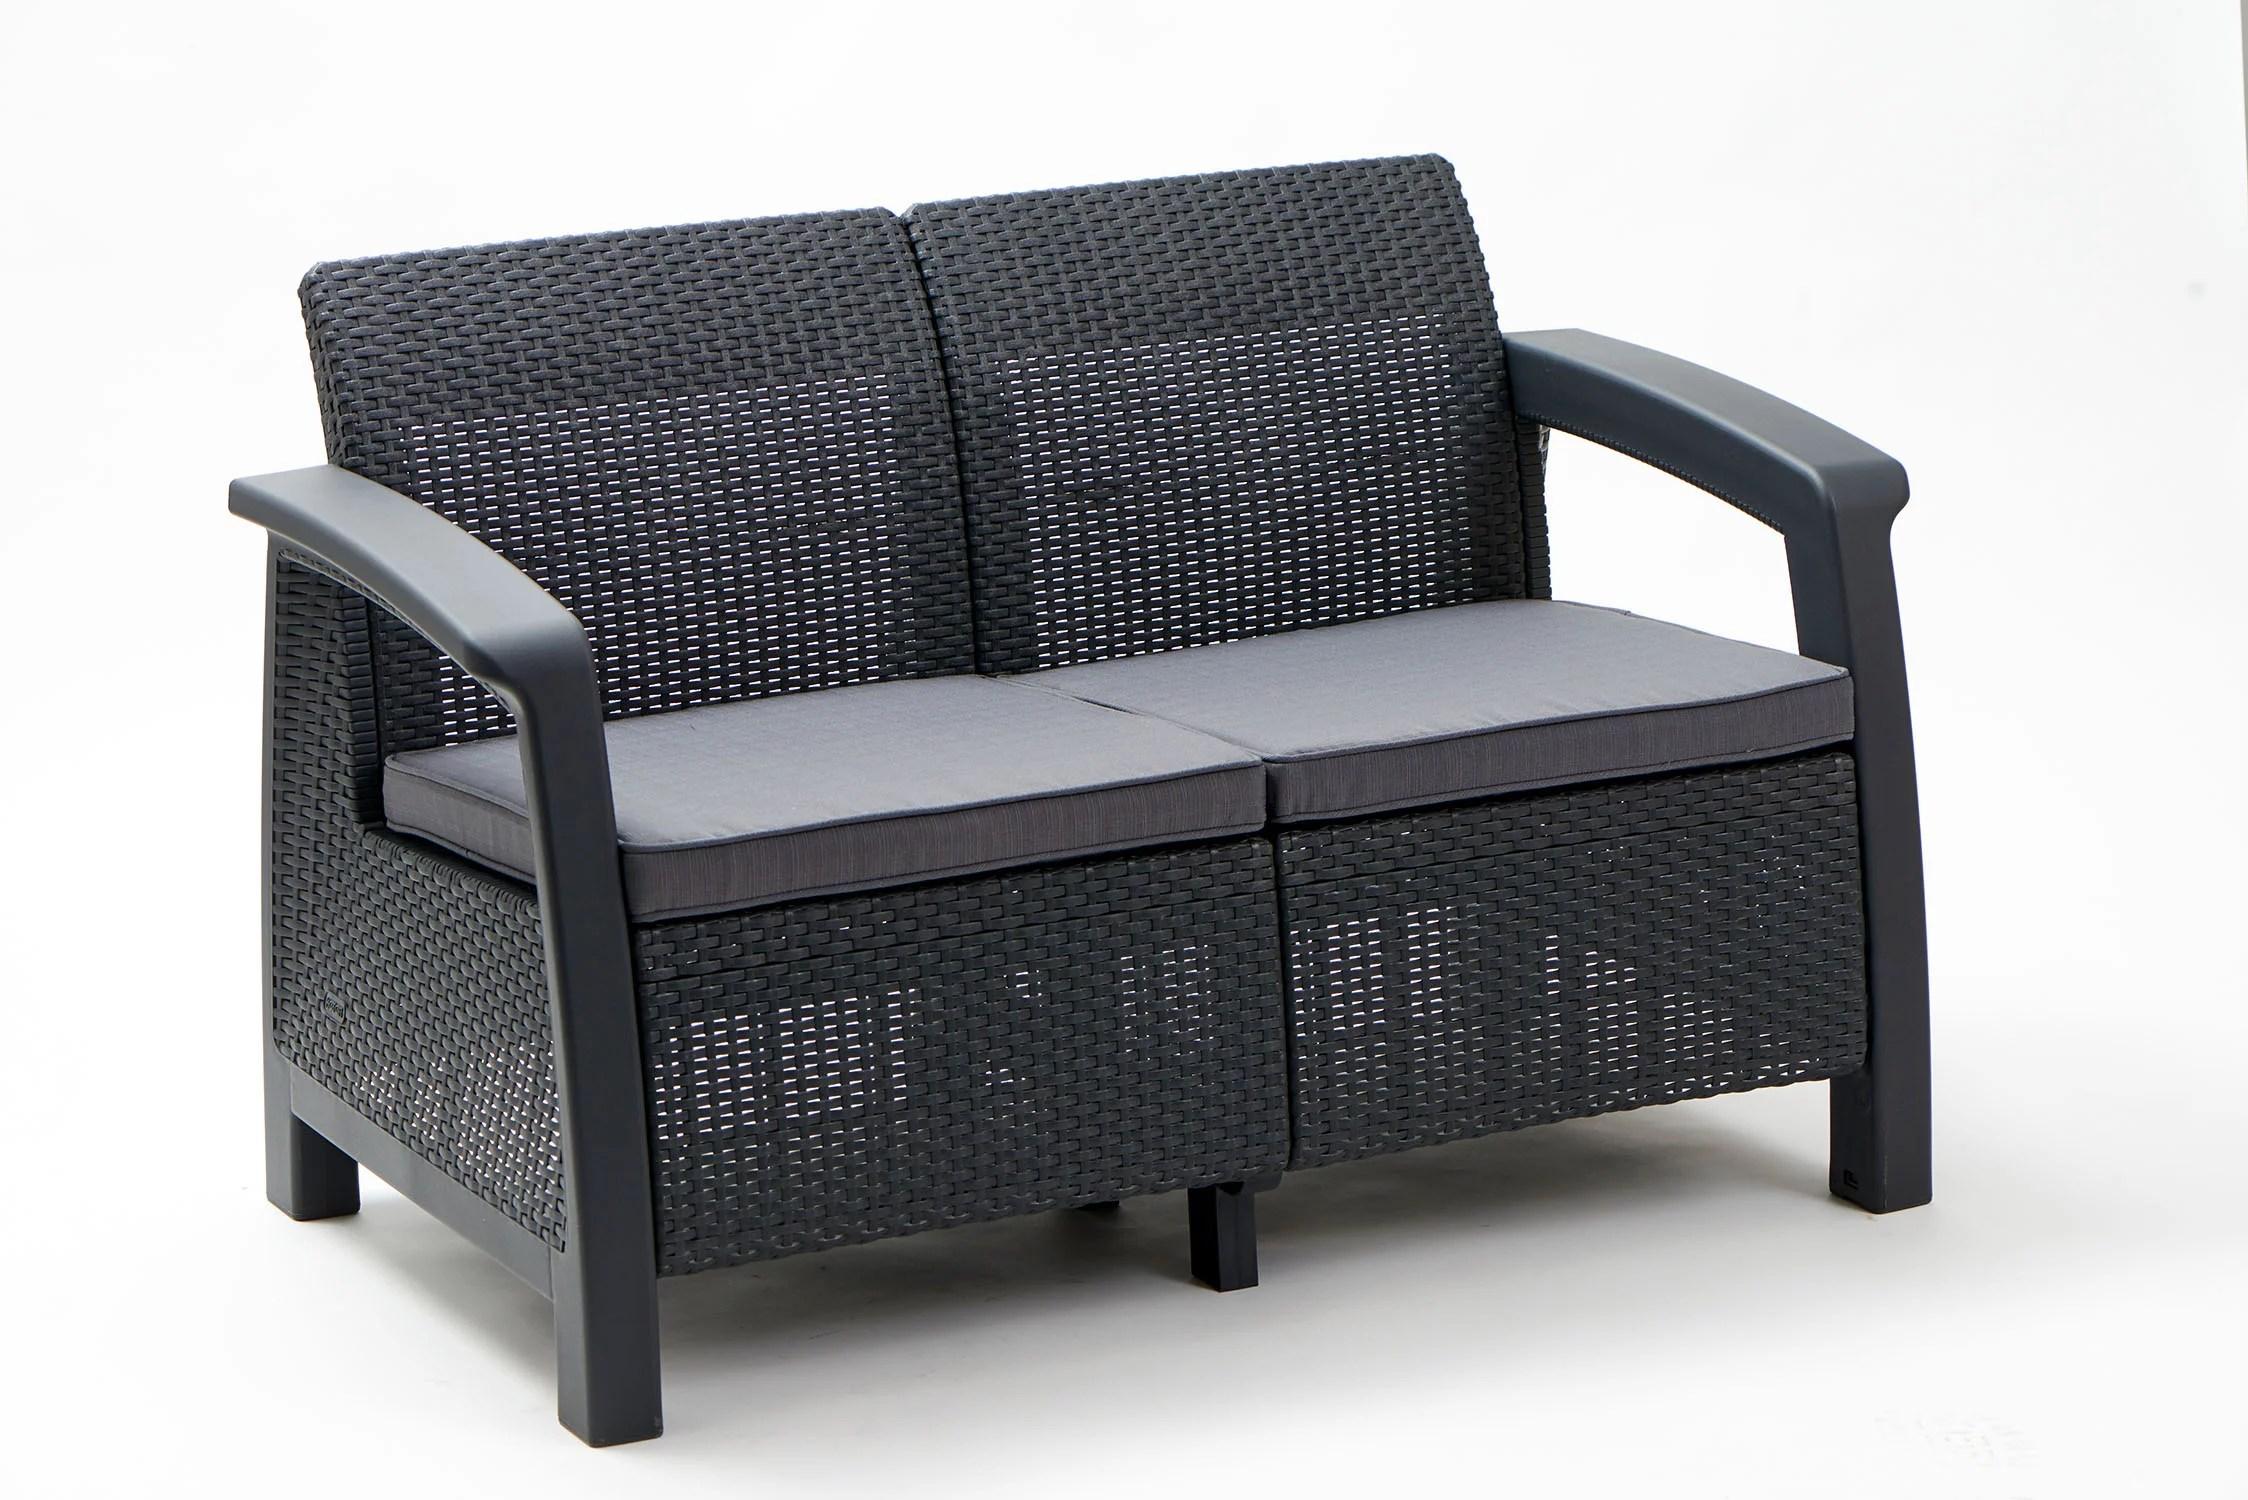 keter bahamas loveseat resin outdoor patio furniture grey walmart com walmart com